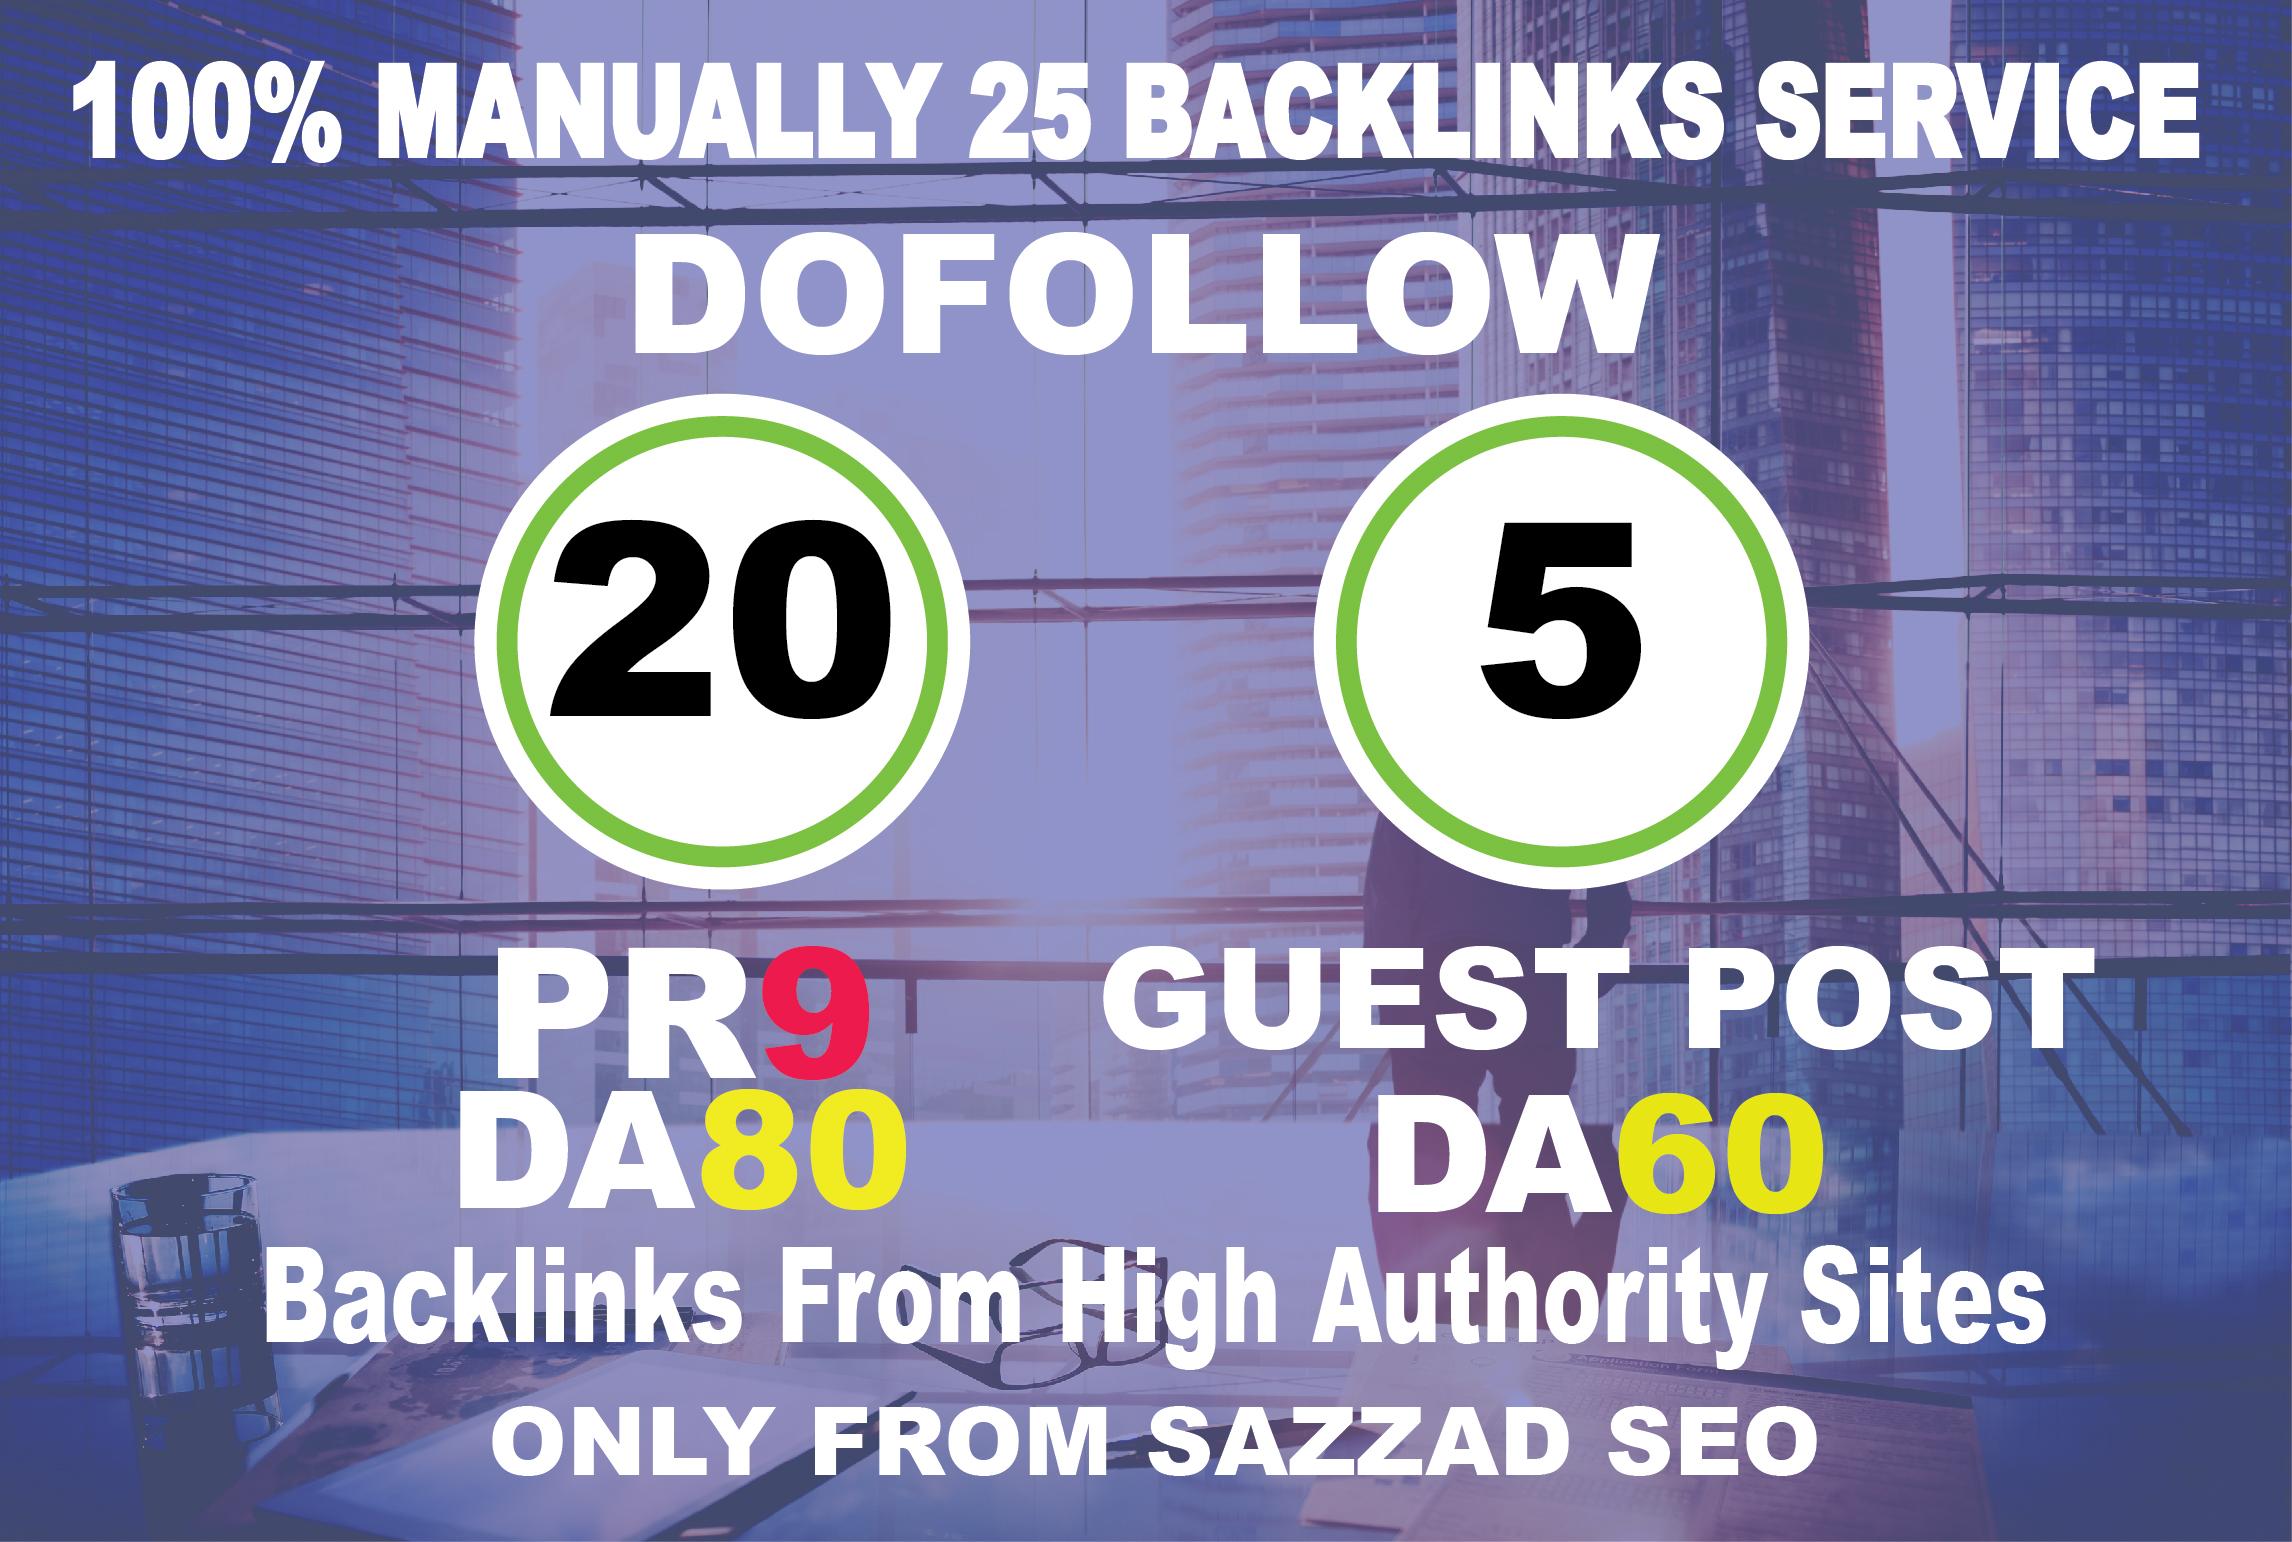 I Will Manually Do 20 PR9 DA80+5 Guest Post On DA60 SEO Backlinks